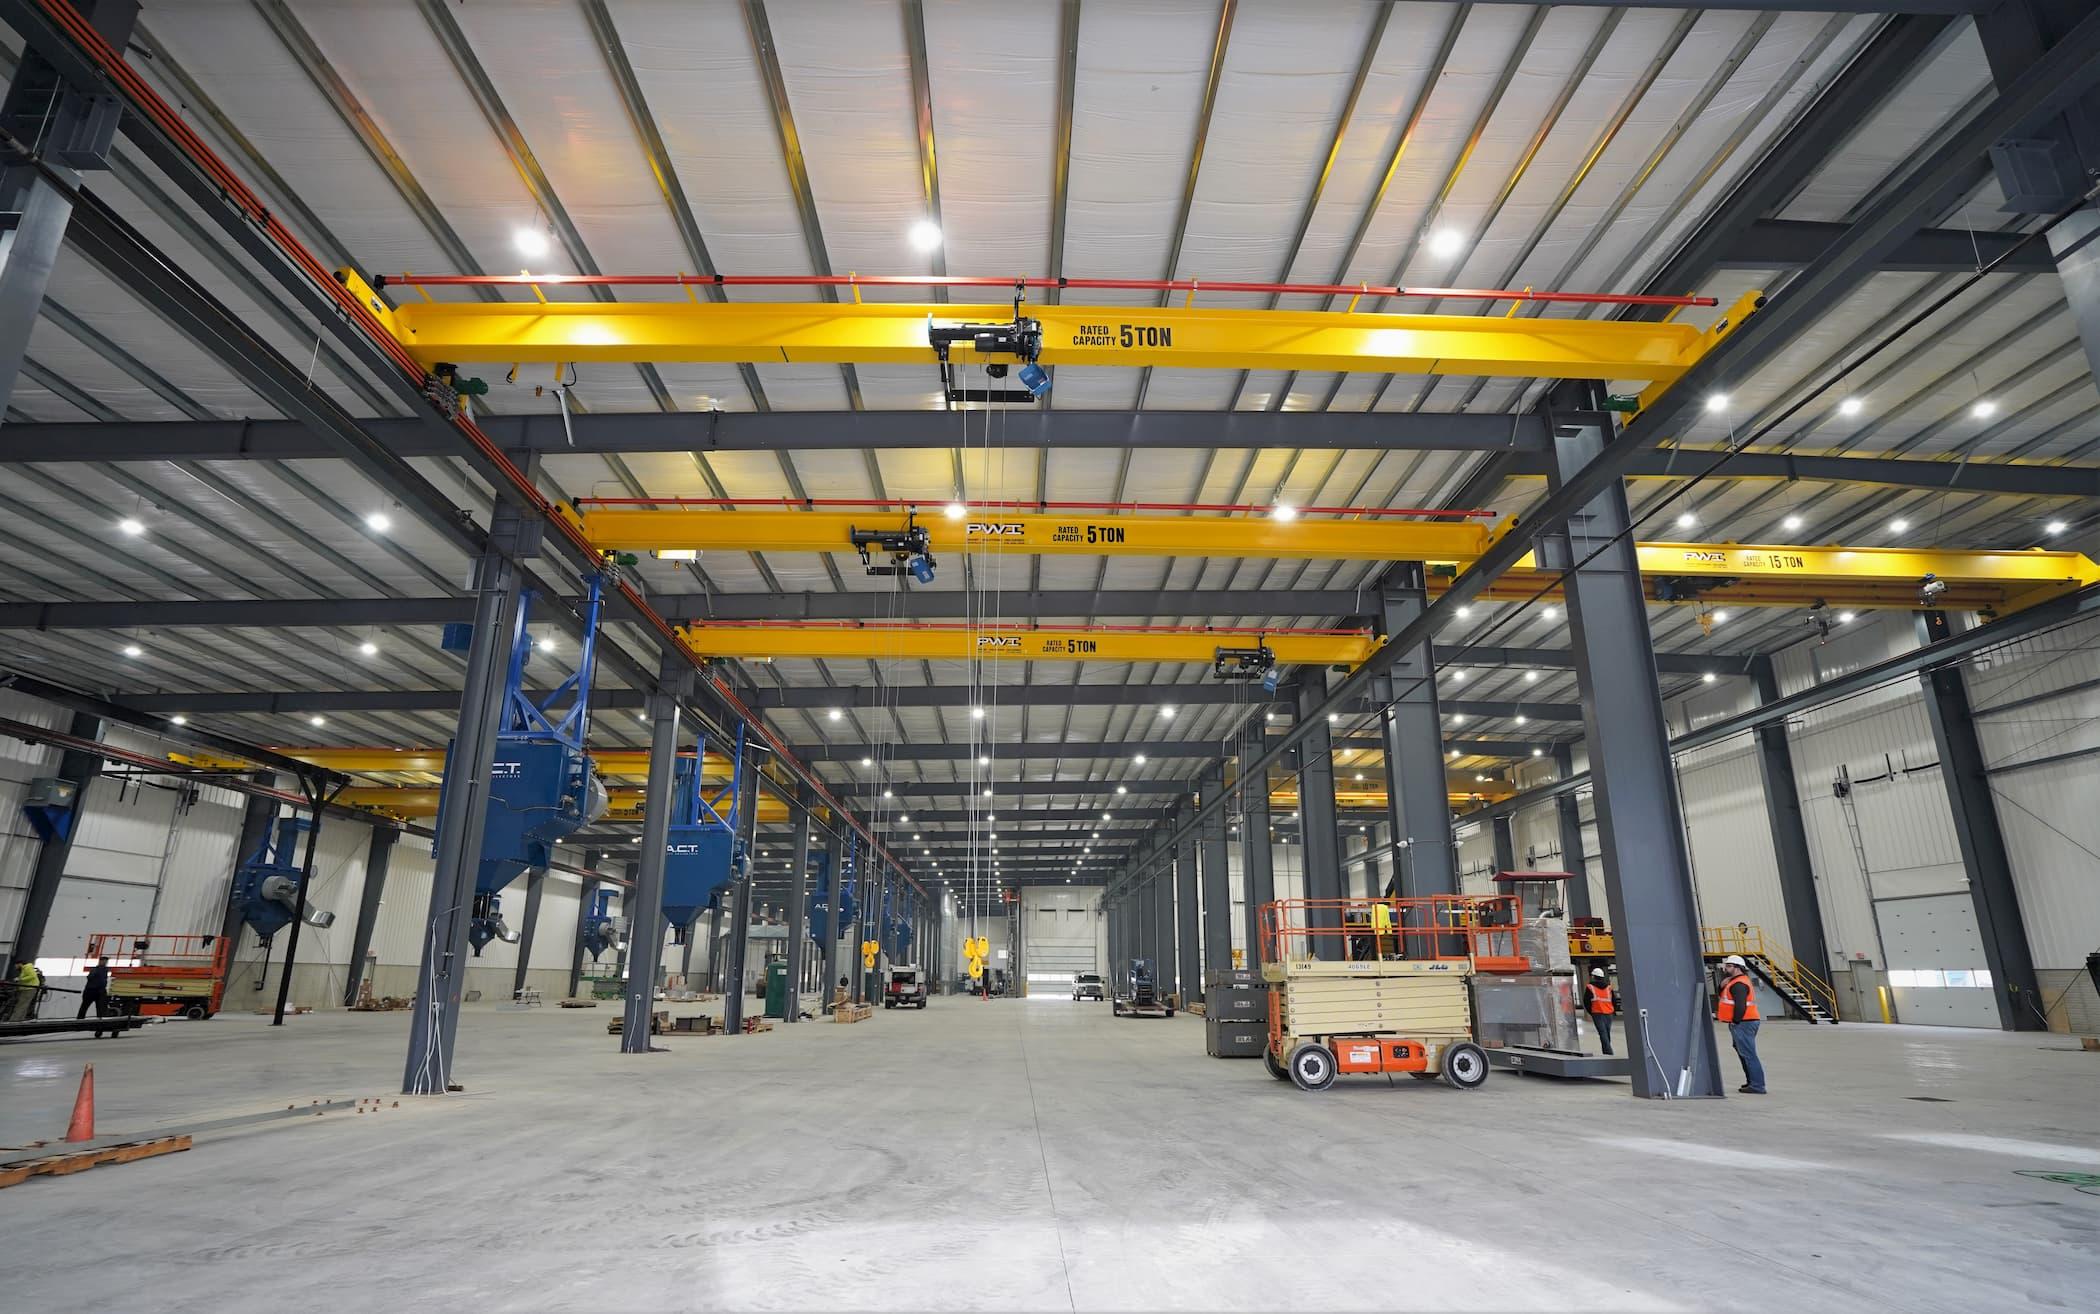 Multiple Overhead Cranes